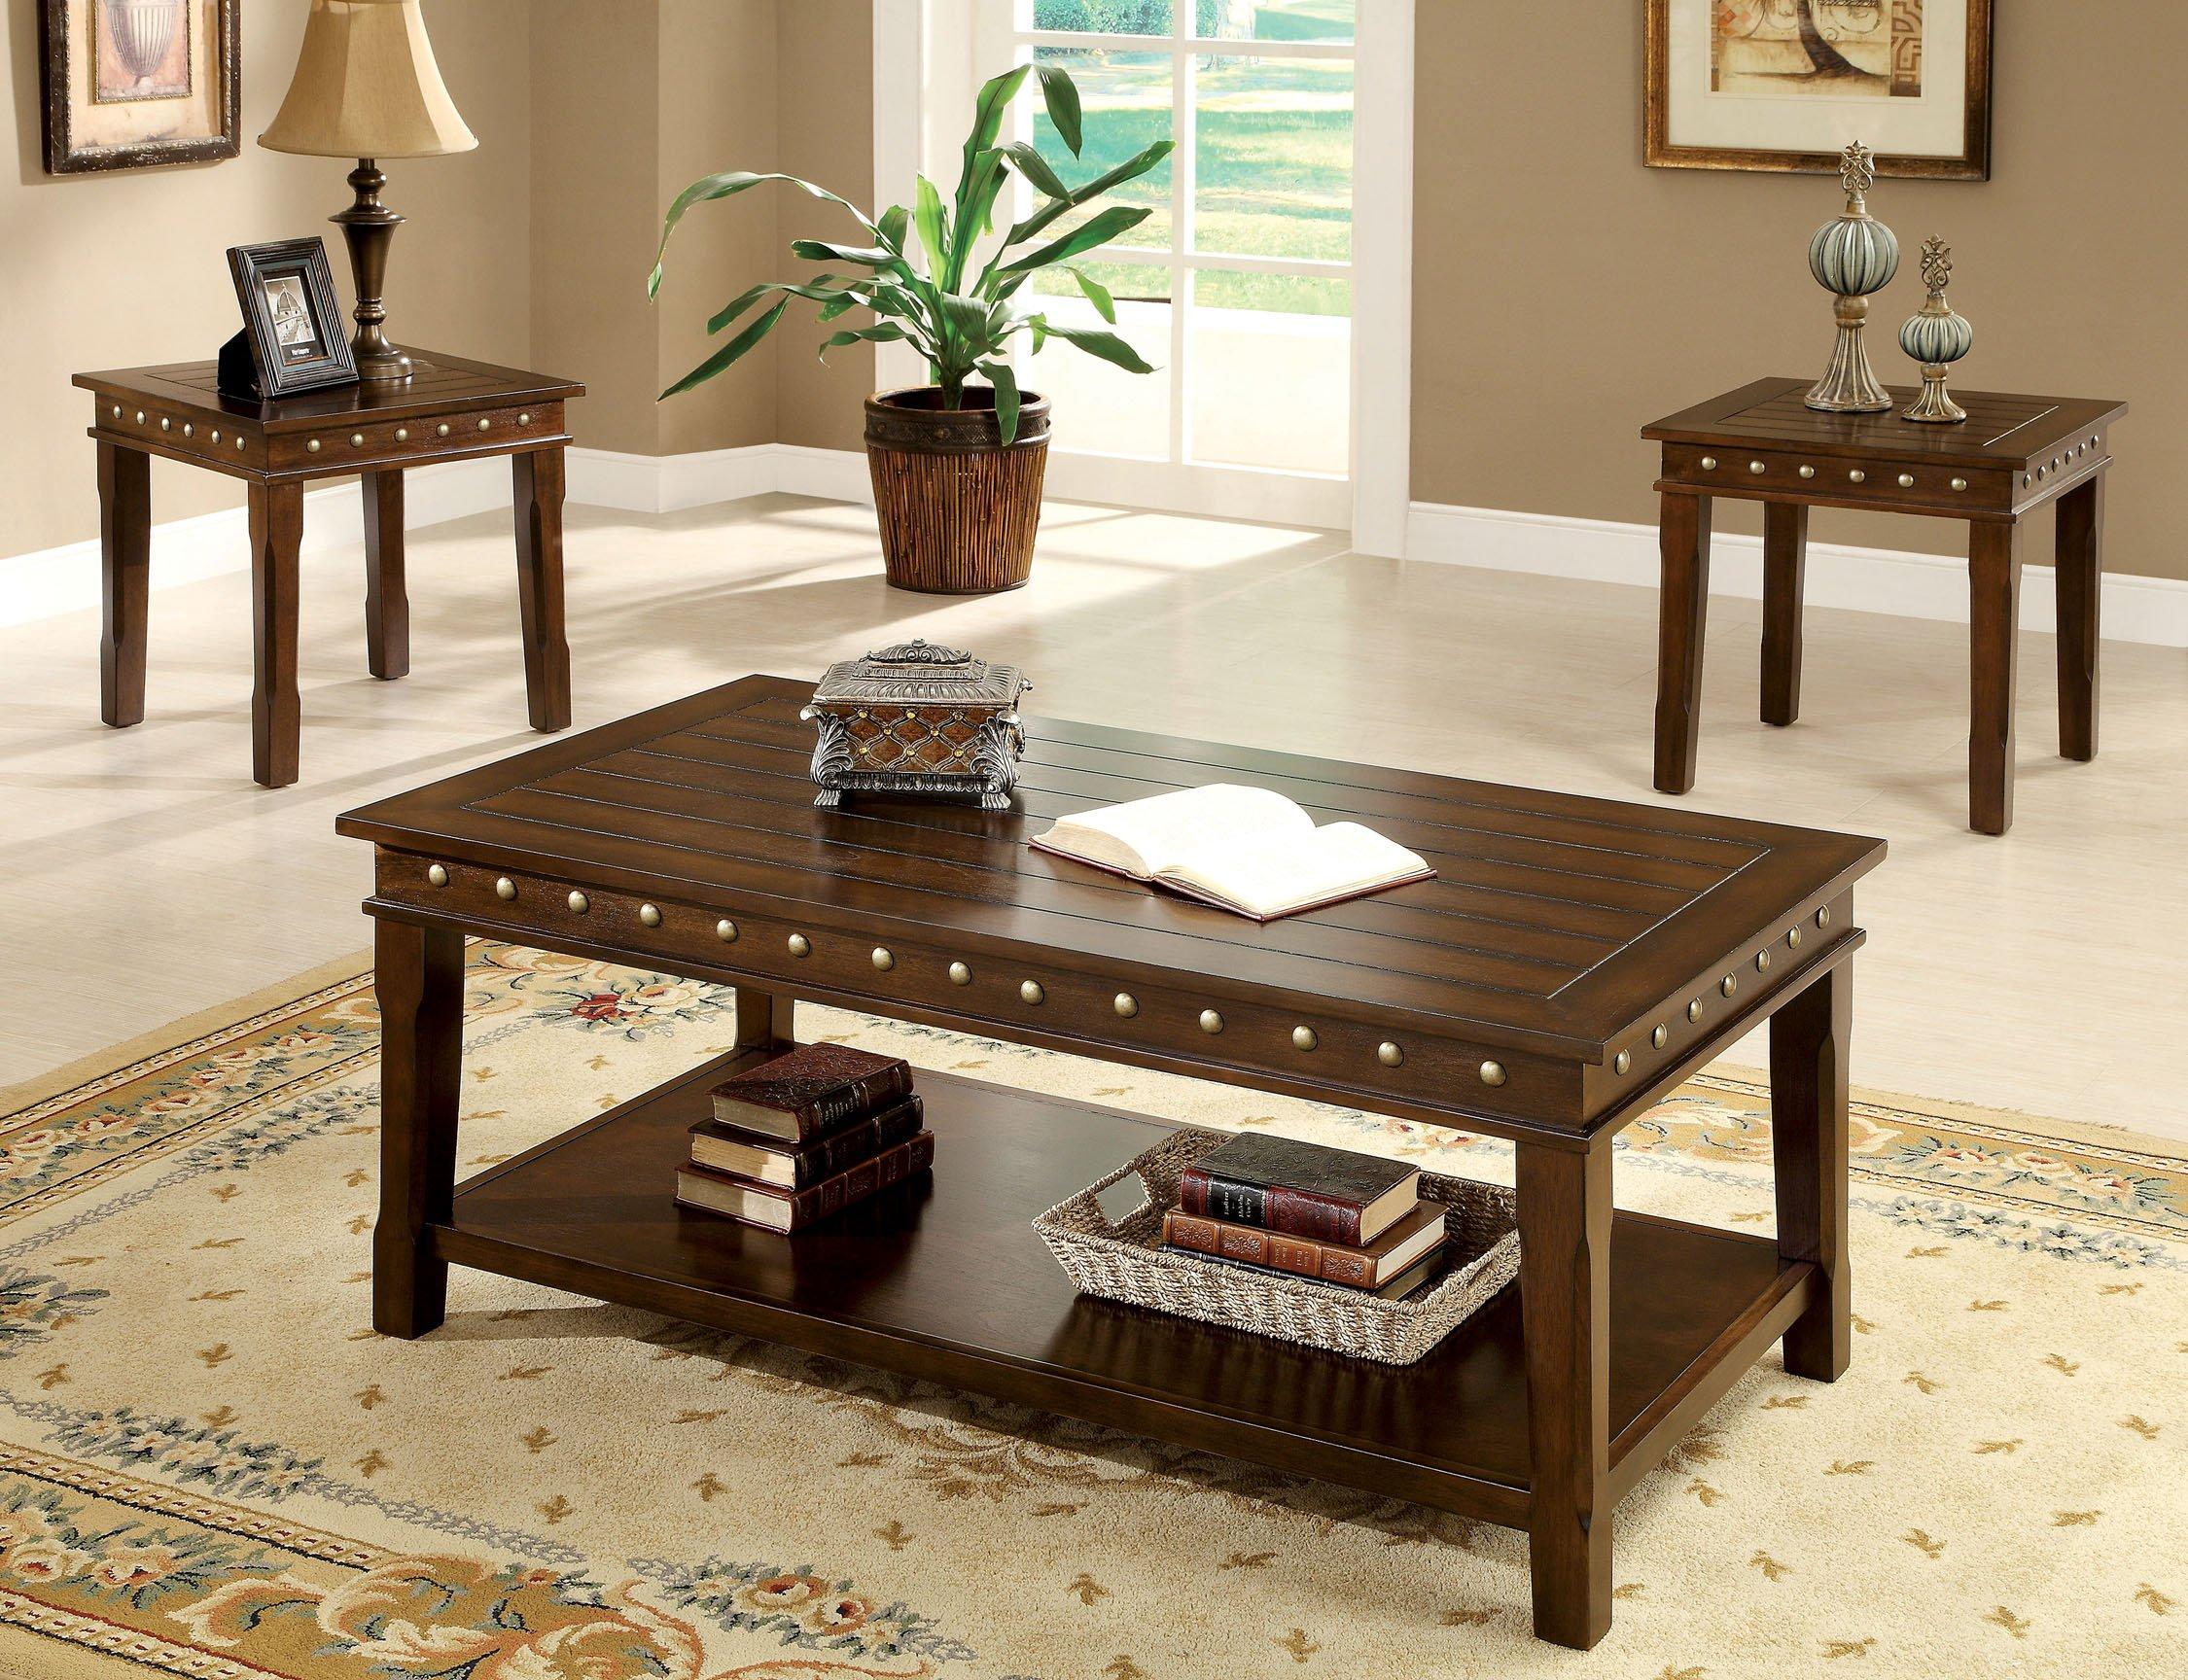 Furniture of America 3-Piece Stevenson Table Set, Walnut Finish by Furniture of America